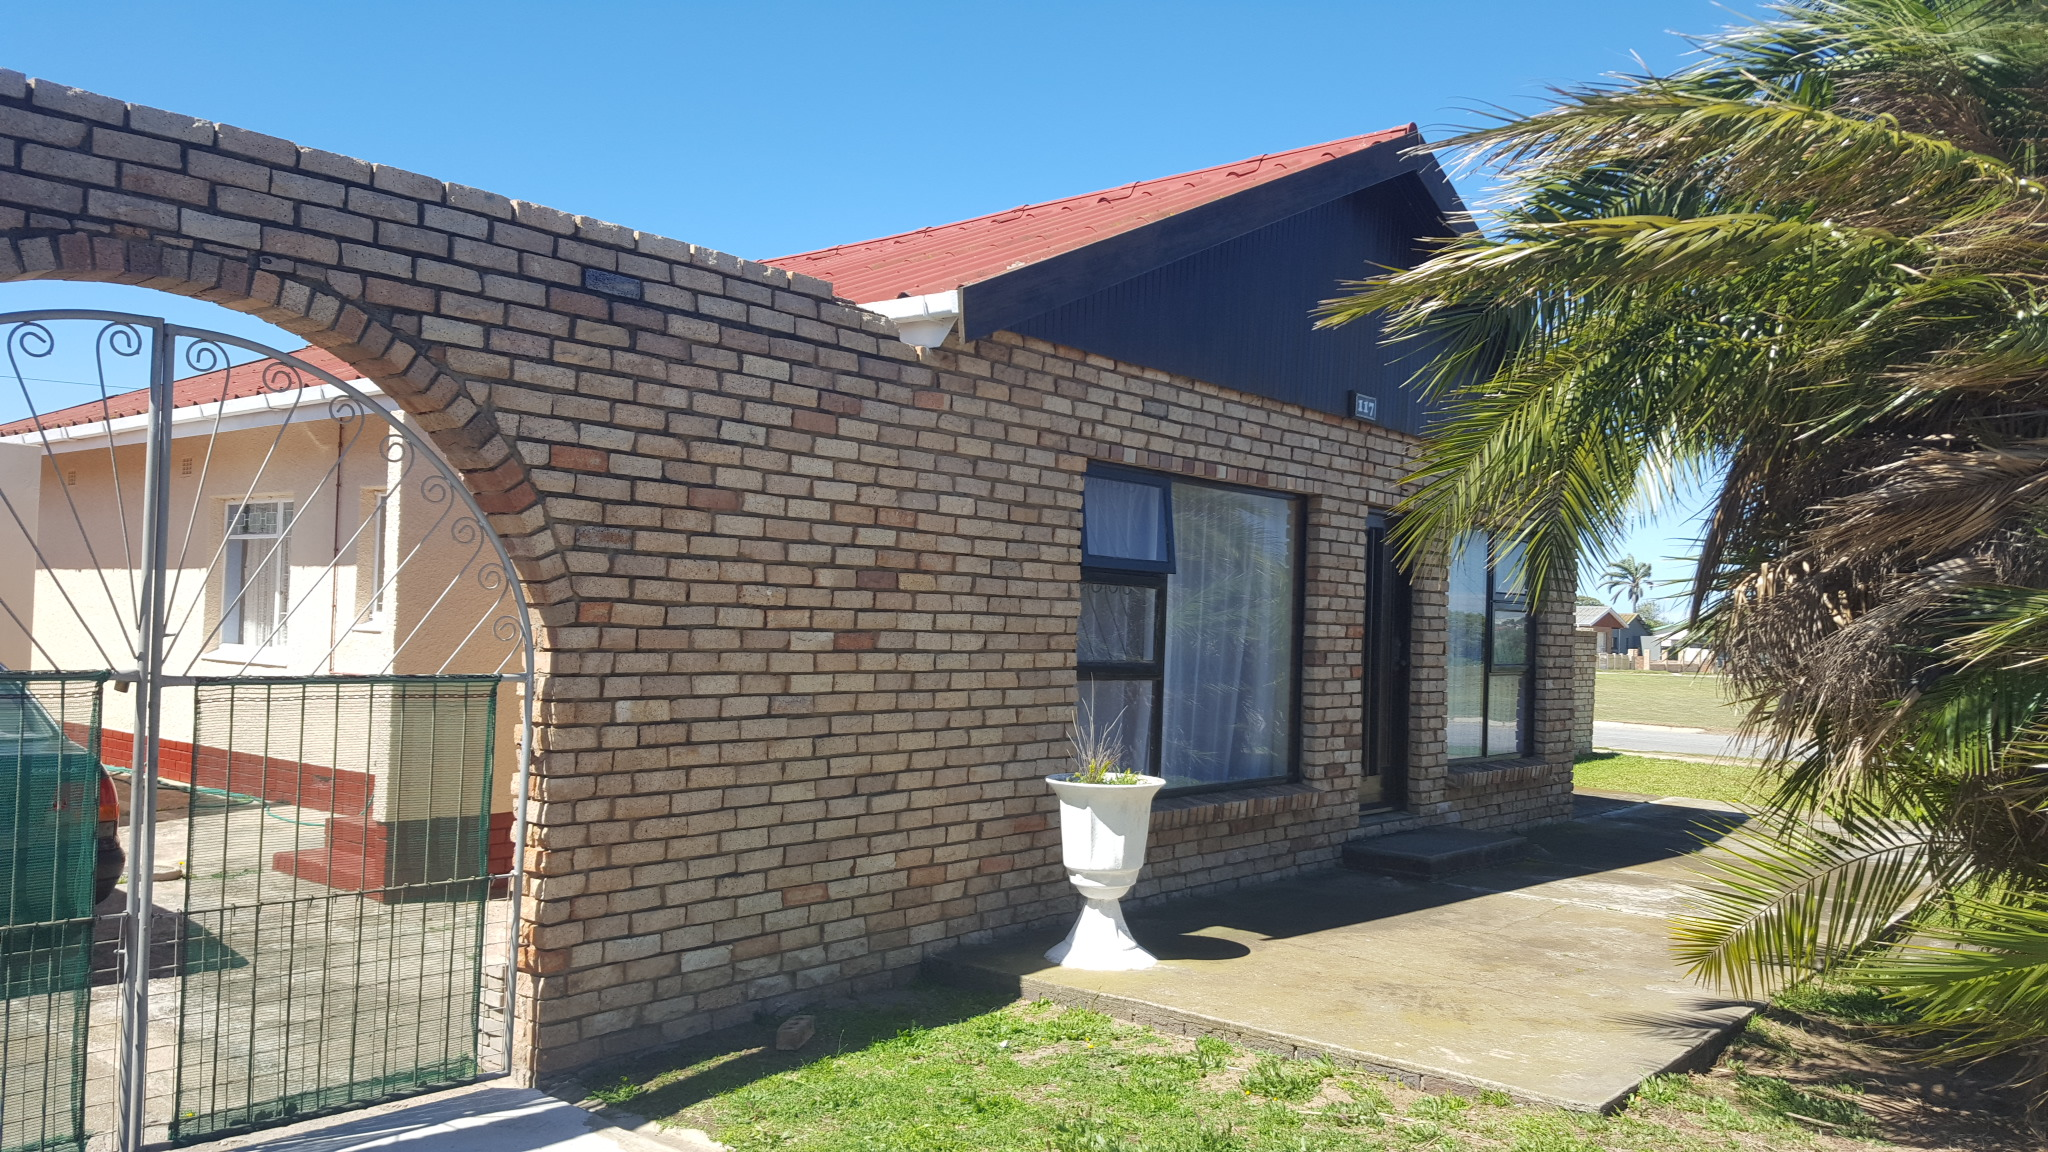 3 BedroomHouse For Sale In Algoapark